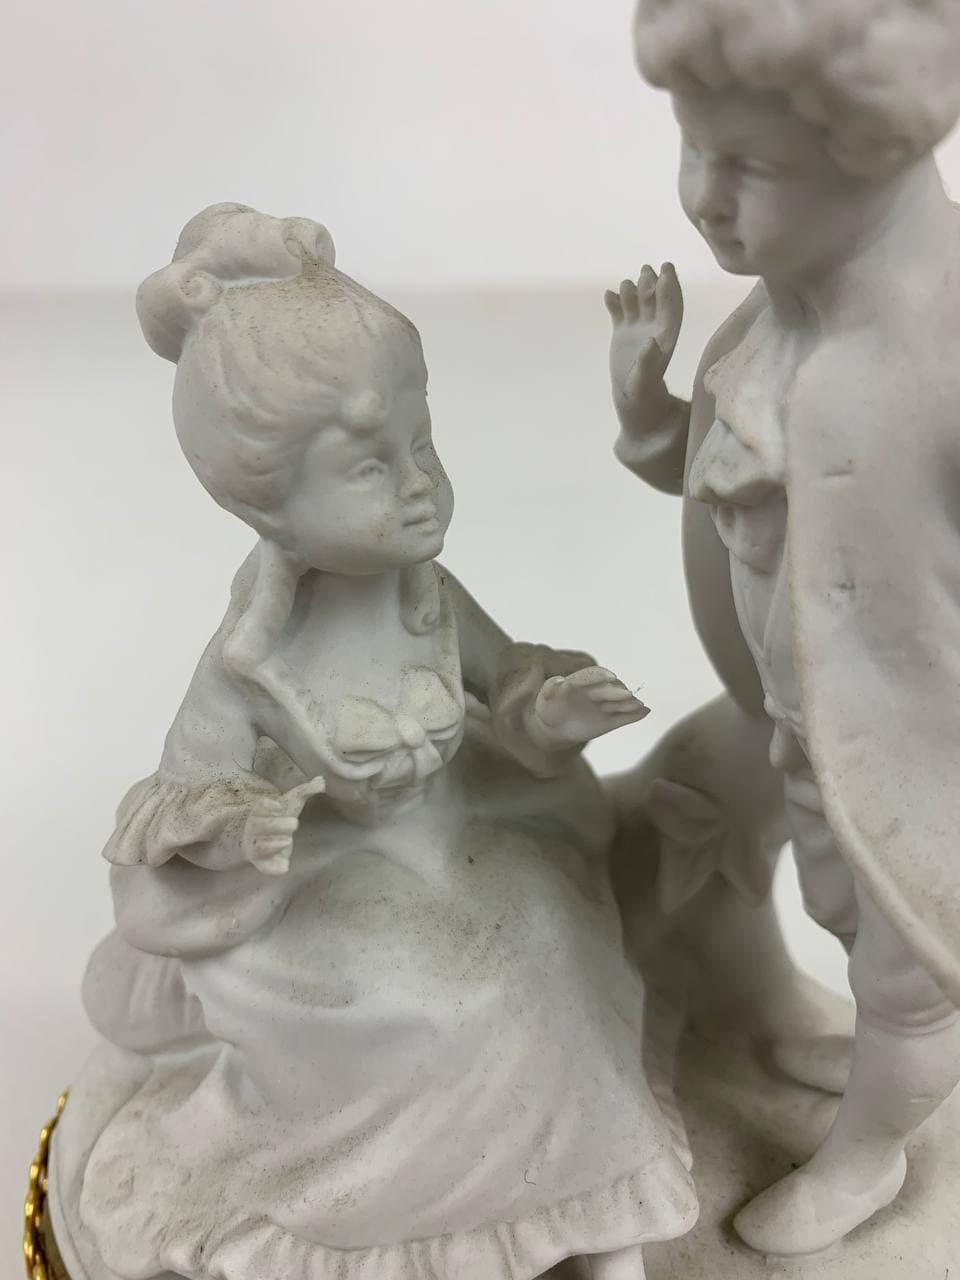 Антикварная фигура из бисквита